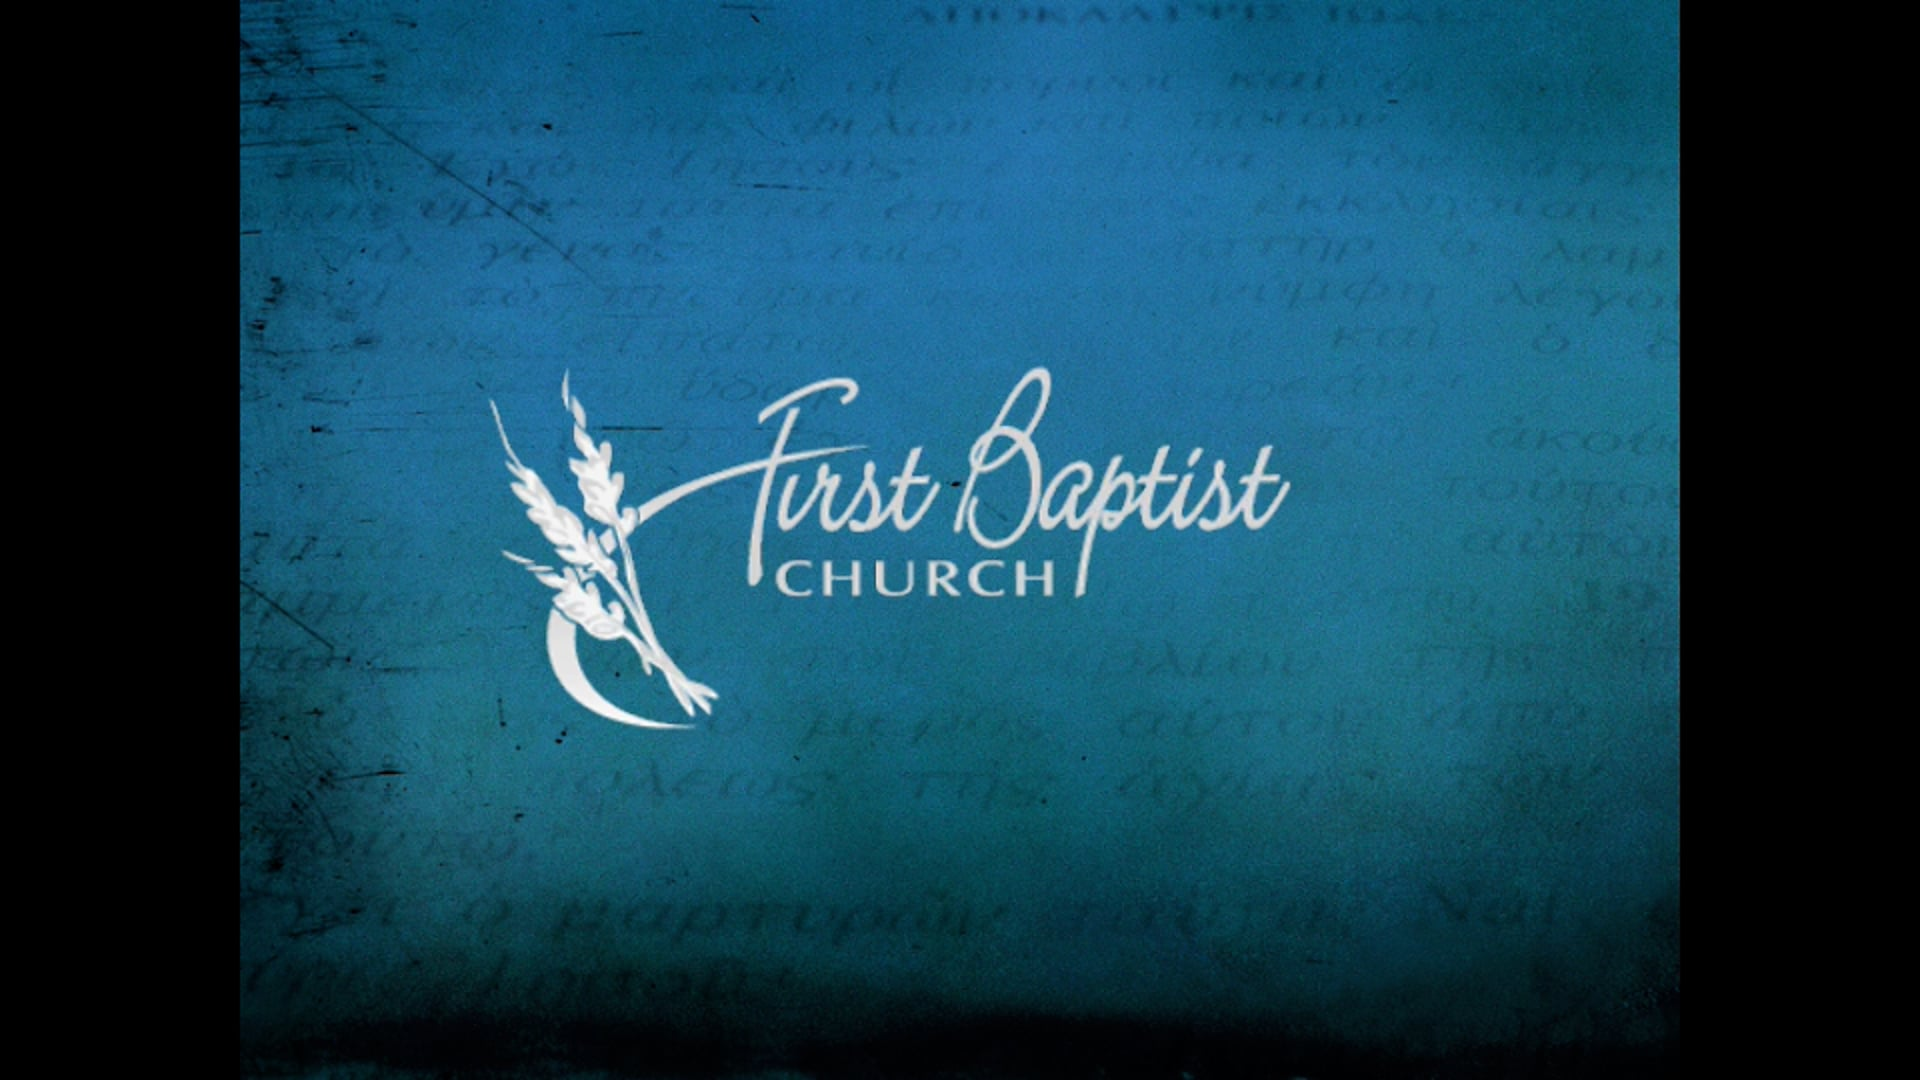 September 12, 2021 Worship Service